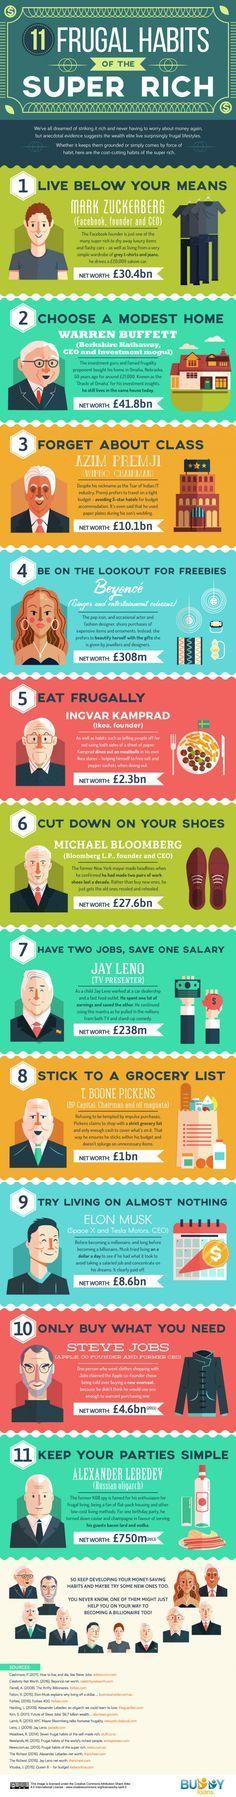 9 best Money images on Pinterest Saving money, Ideas and Little